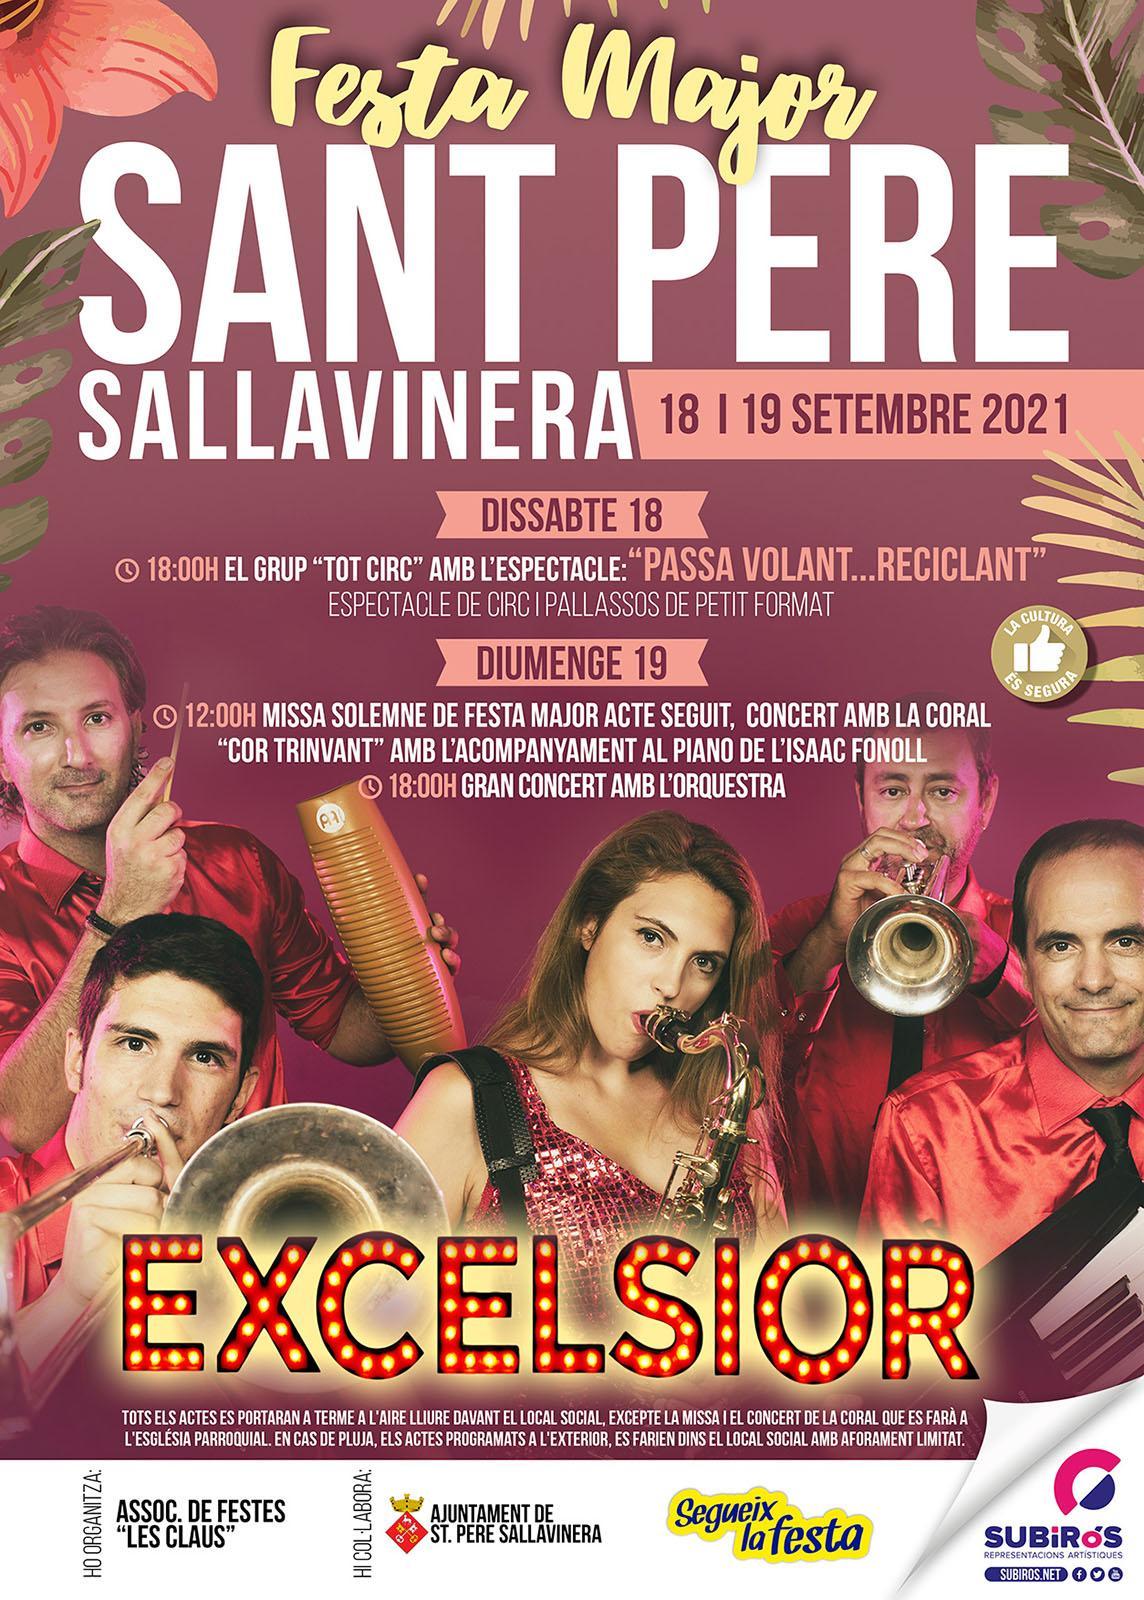 cartell Festa Major de Sant Pere Sallavinera 2021